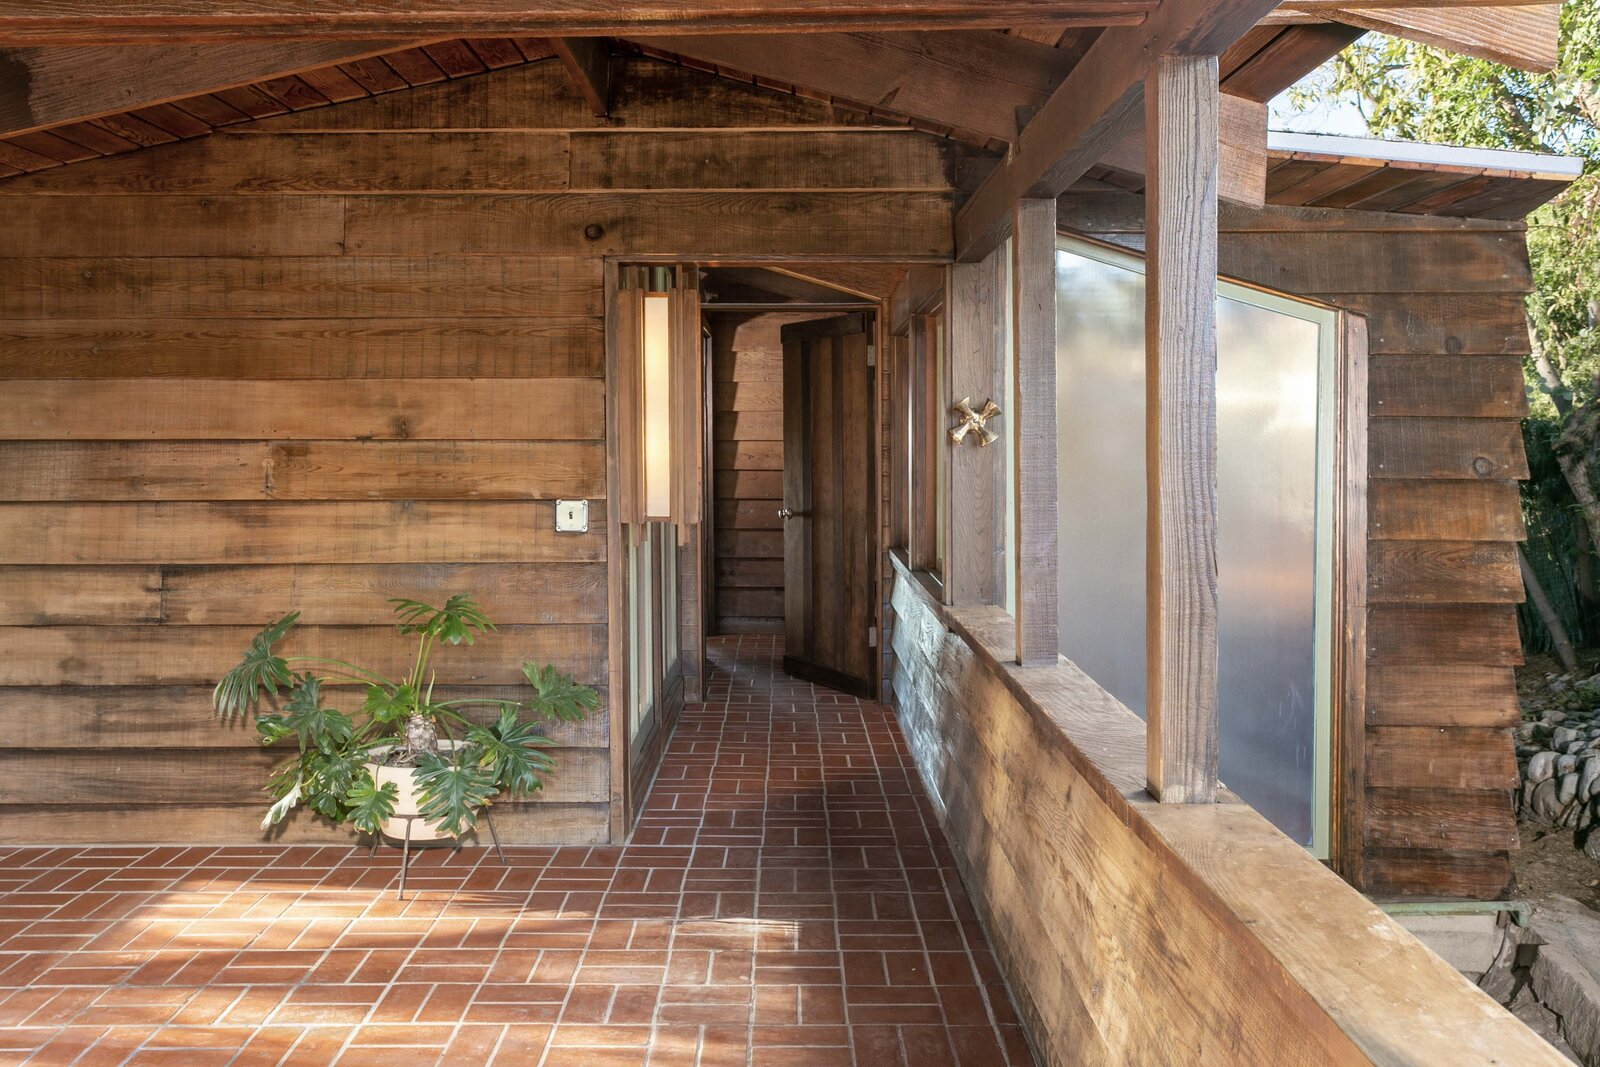 Killion Residence entryway